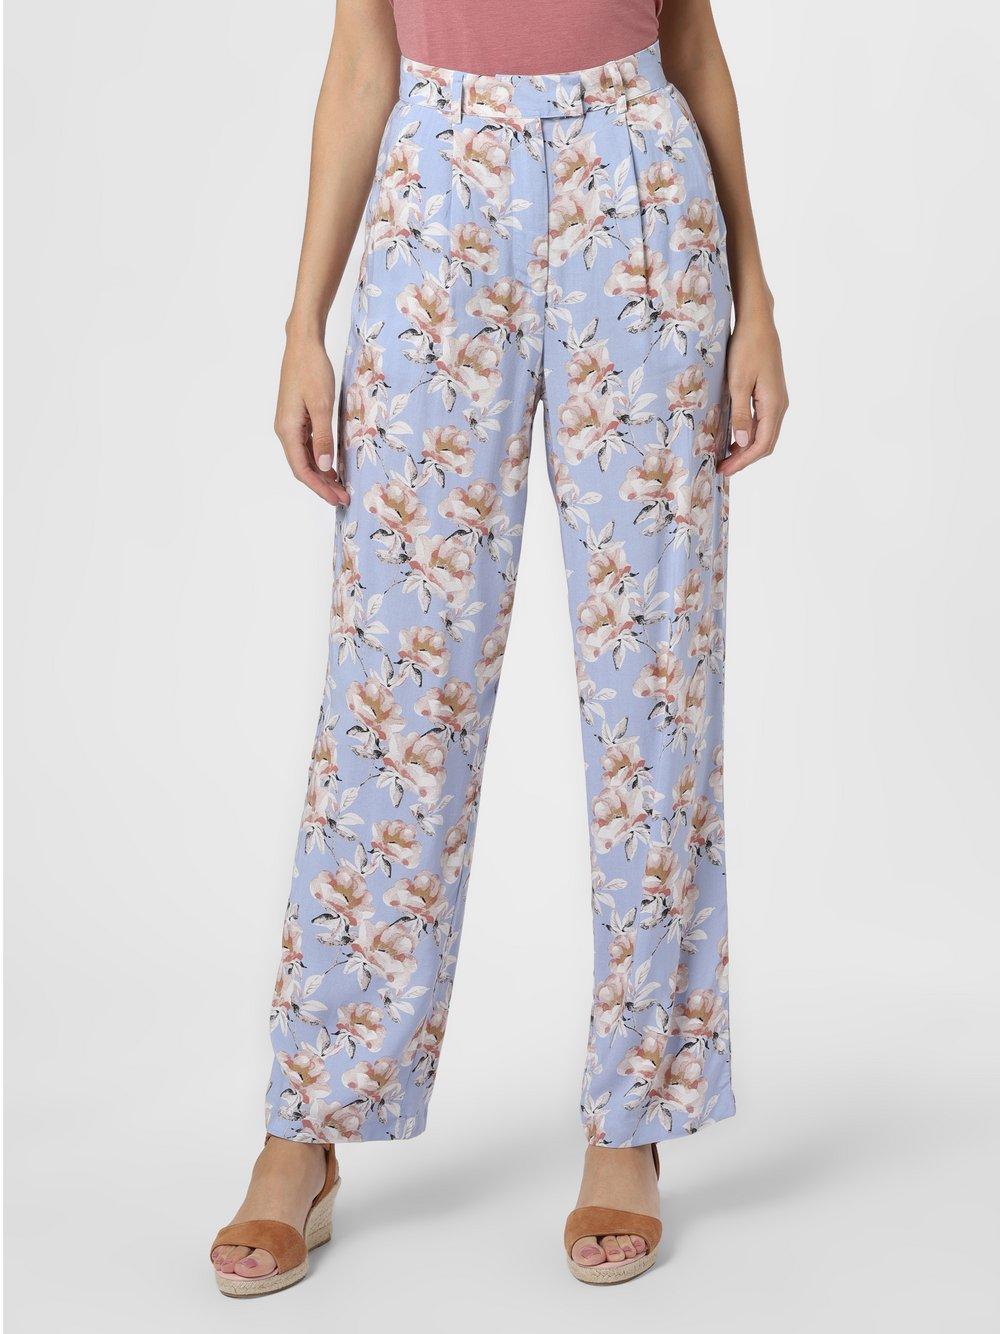 NA-KD – Spodnie damskie, niebieski Van Graaf 475664-0001-00360